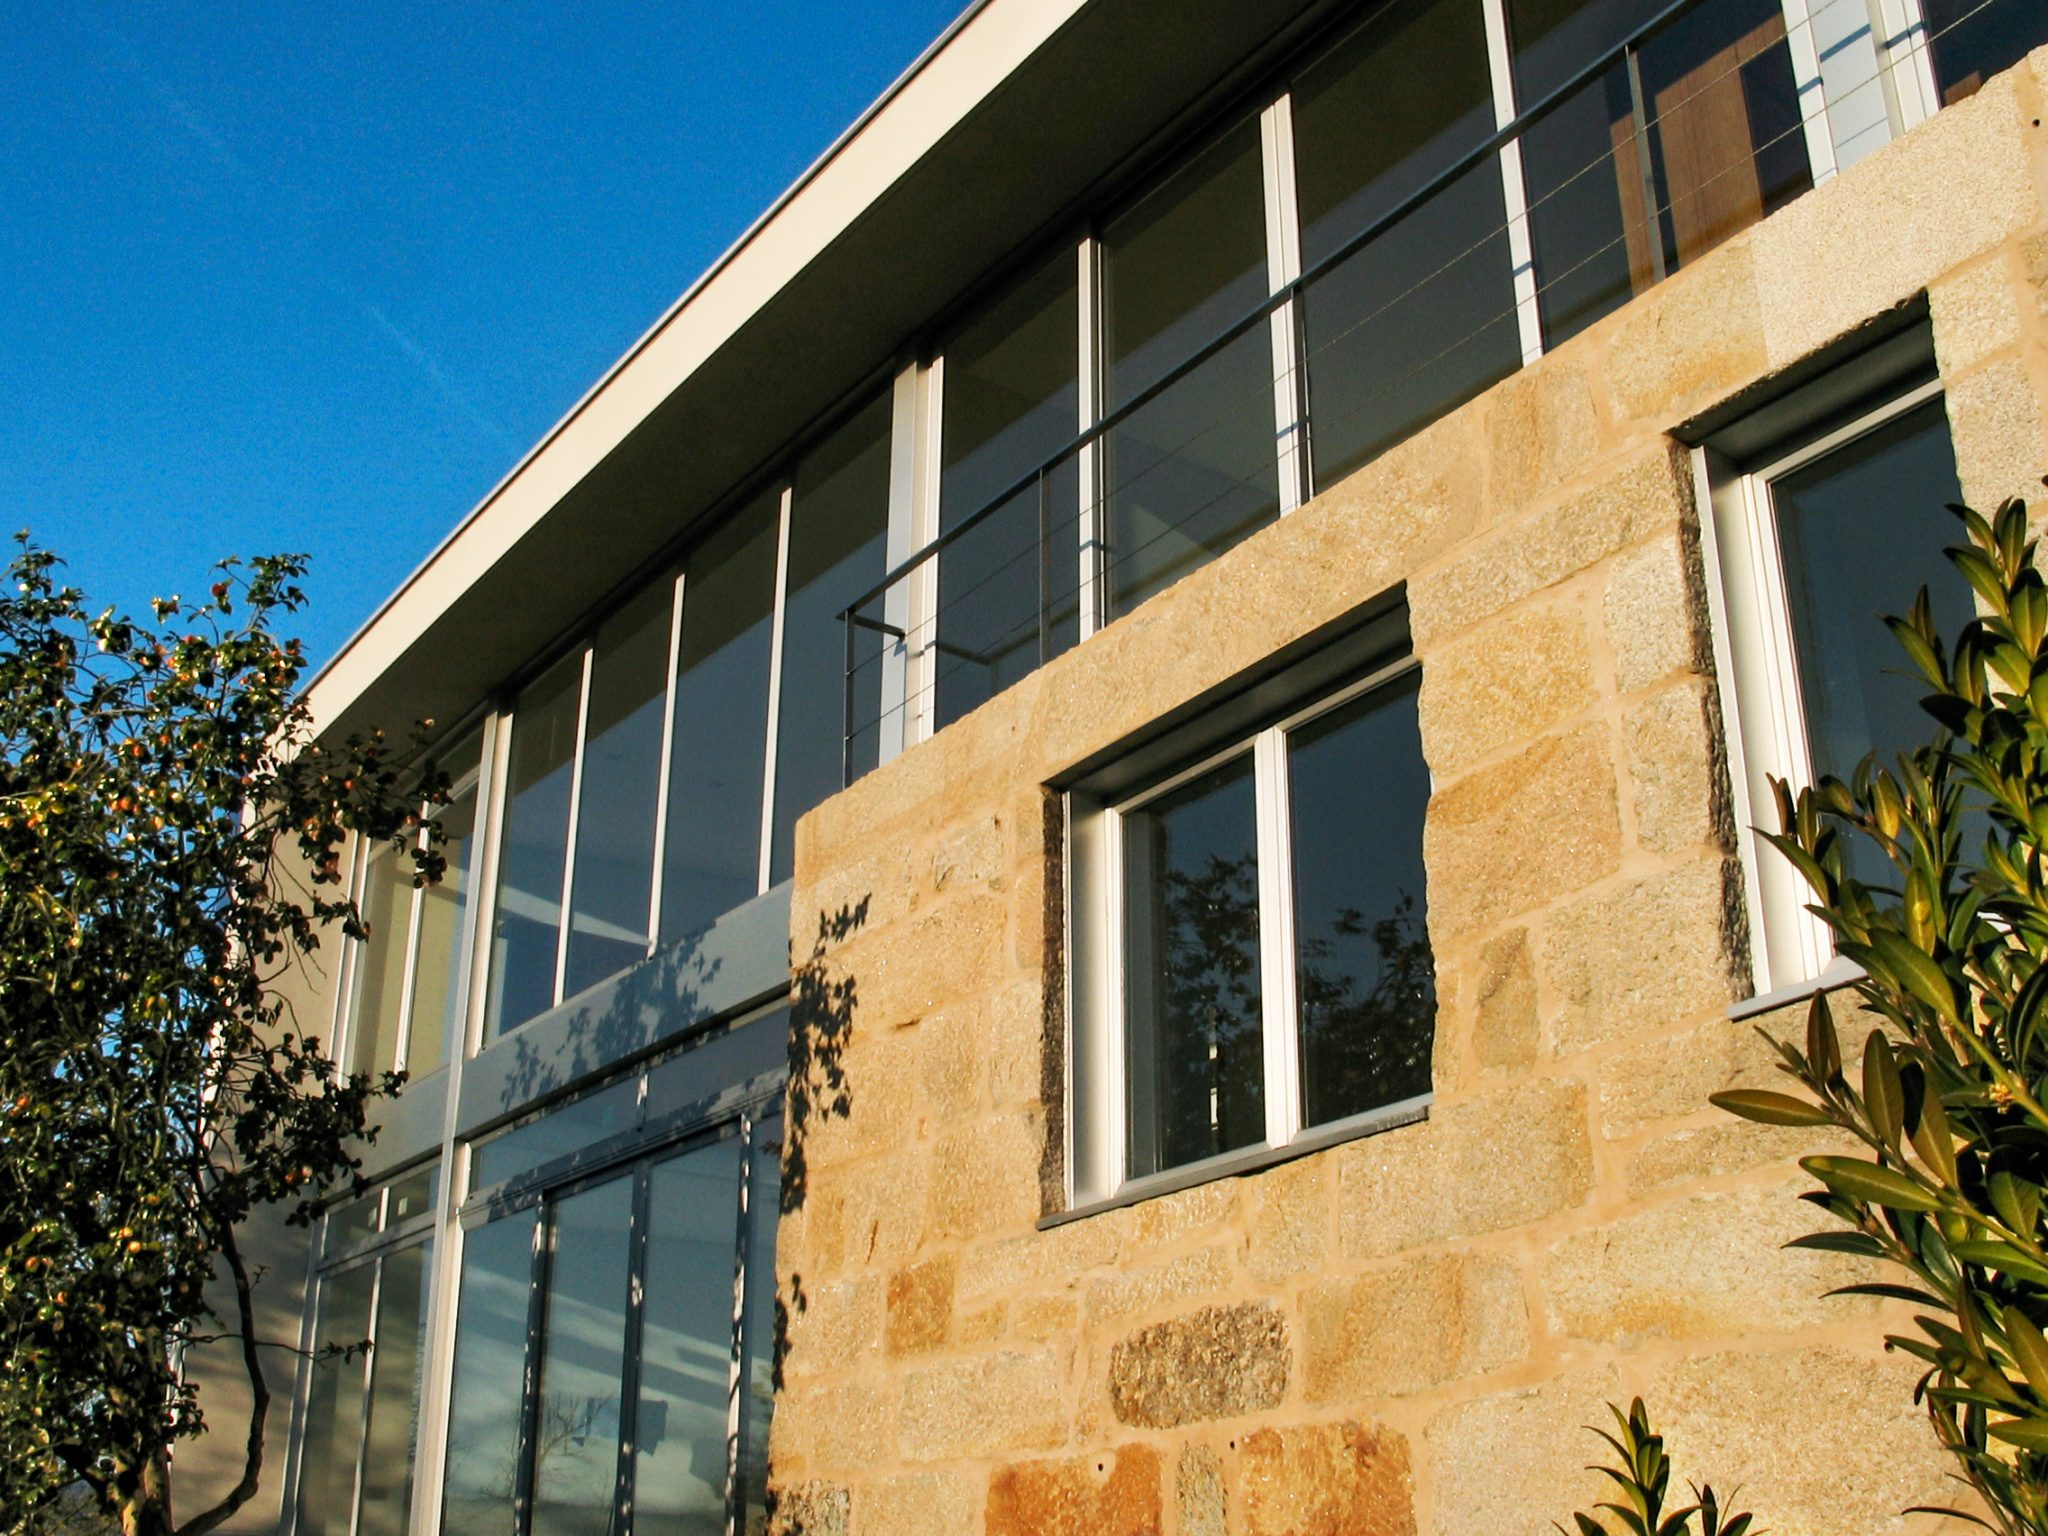 rehabilitacion-de-viviendas-galicia